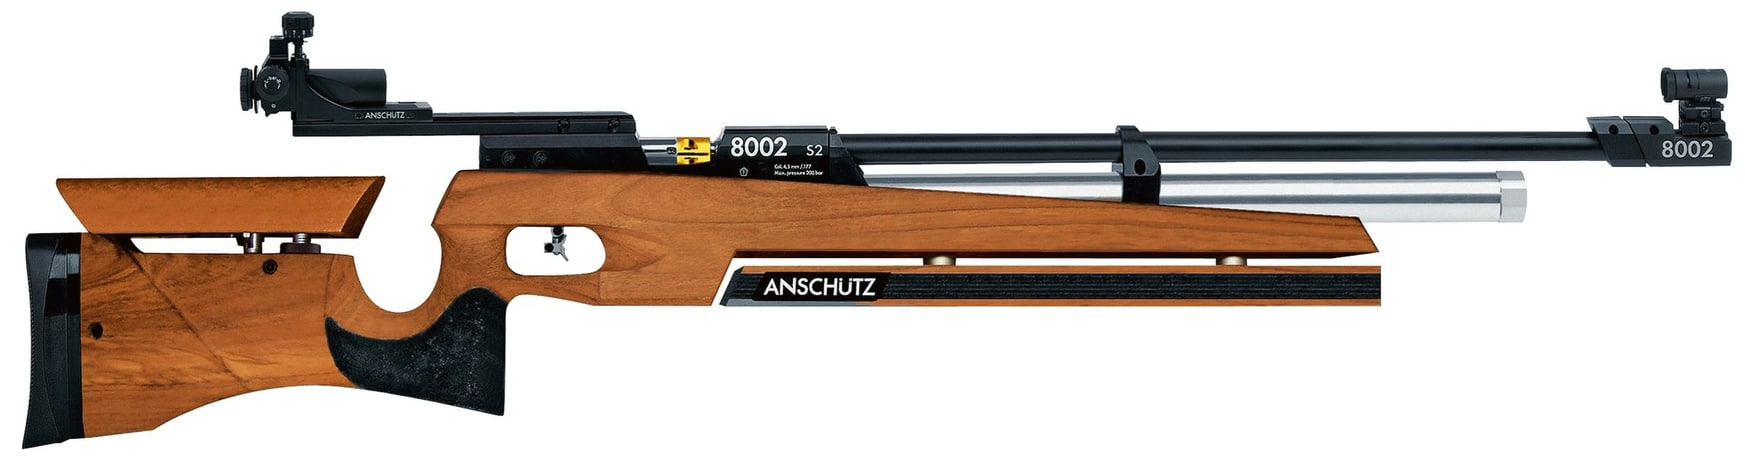 carabine-10m-vendee